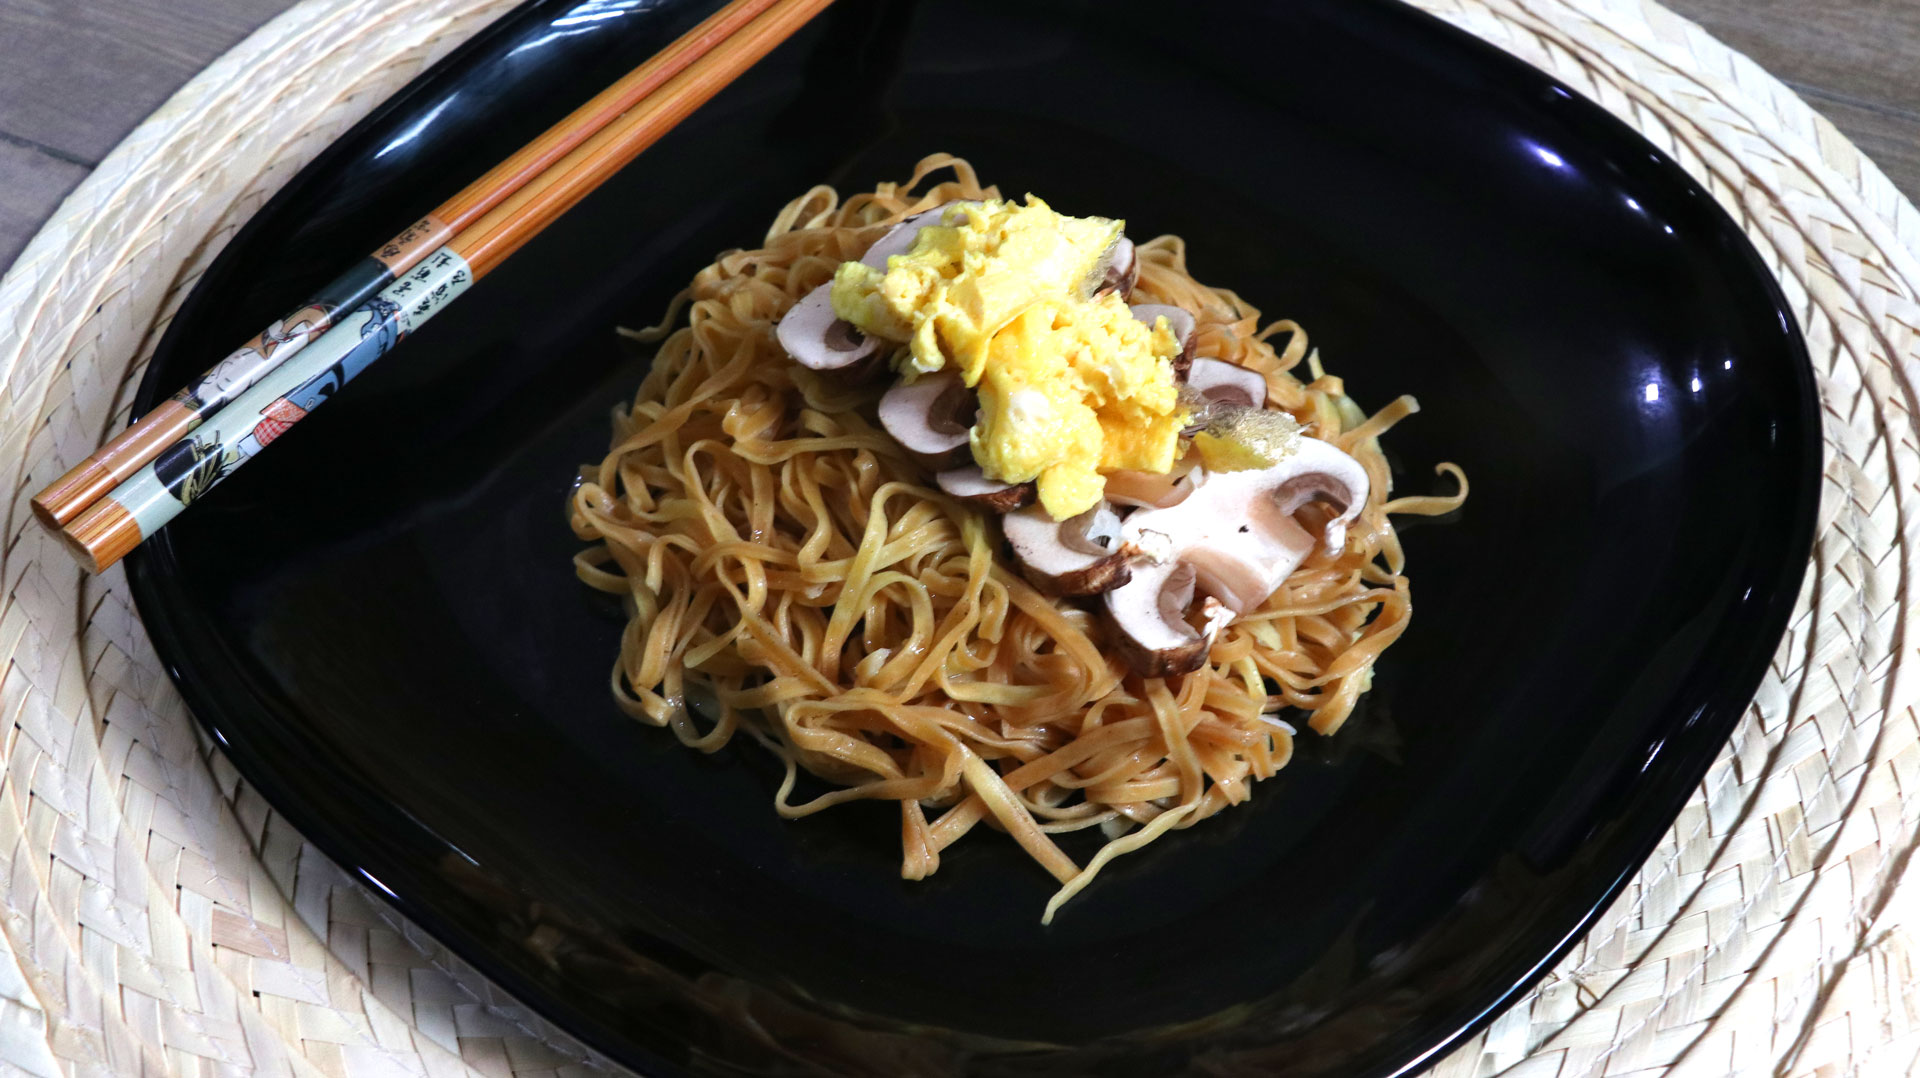 two-bad-chefs-mushroom-noodles-dish-02.jpg